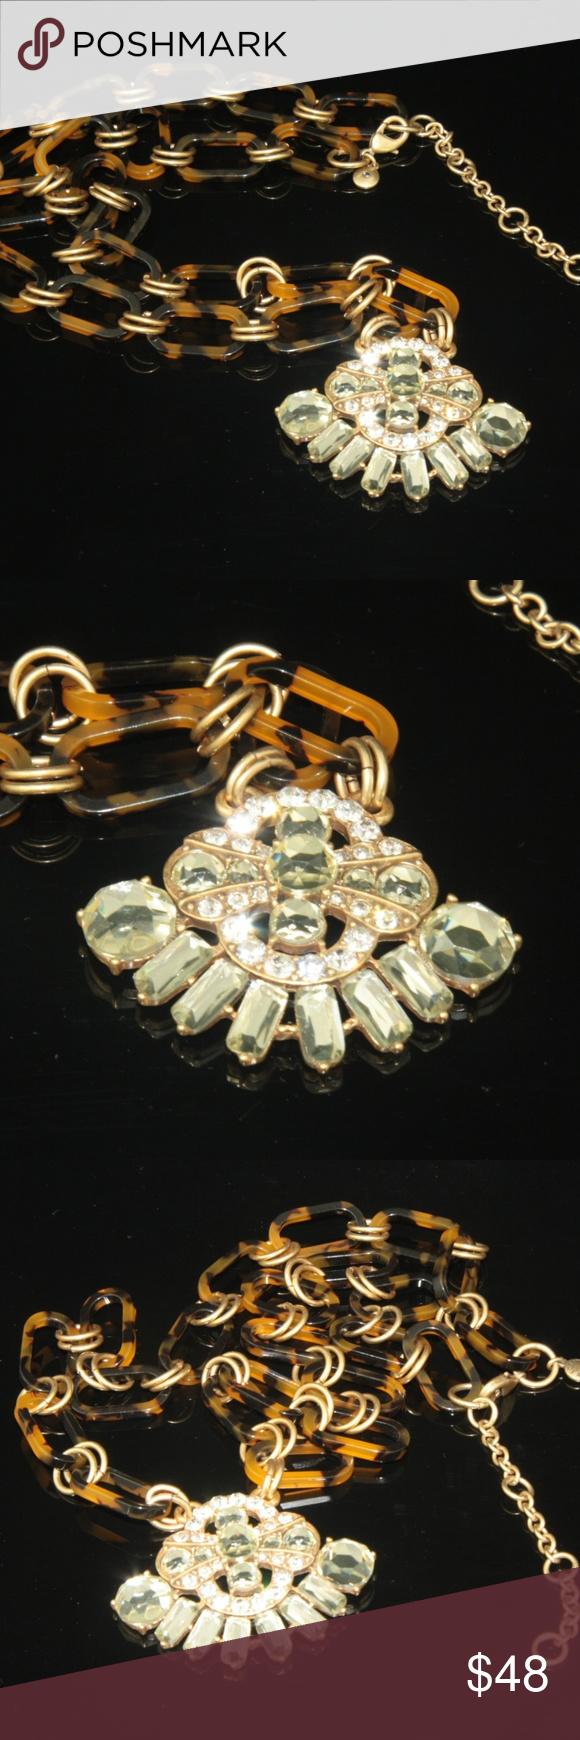 J crew rhinestone pendant necklace necklace length guide